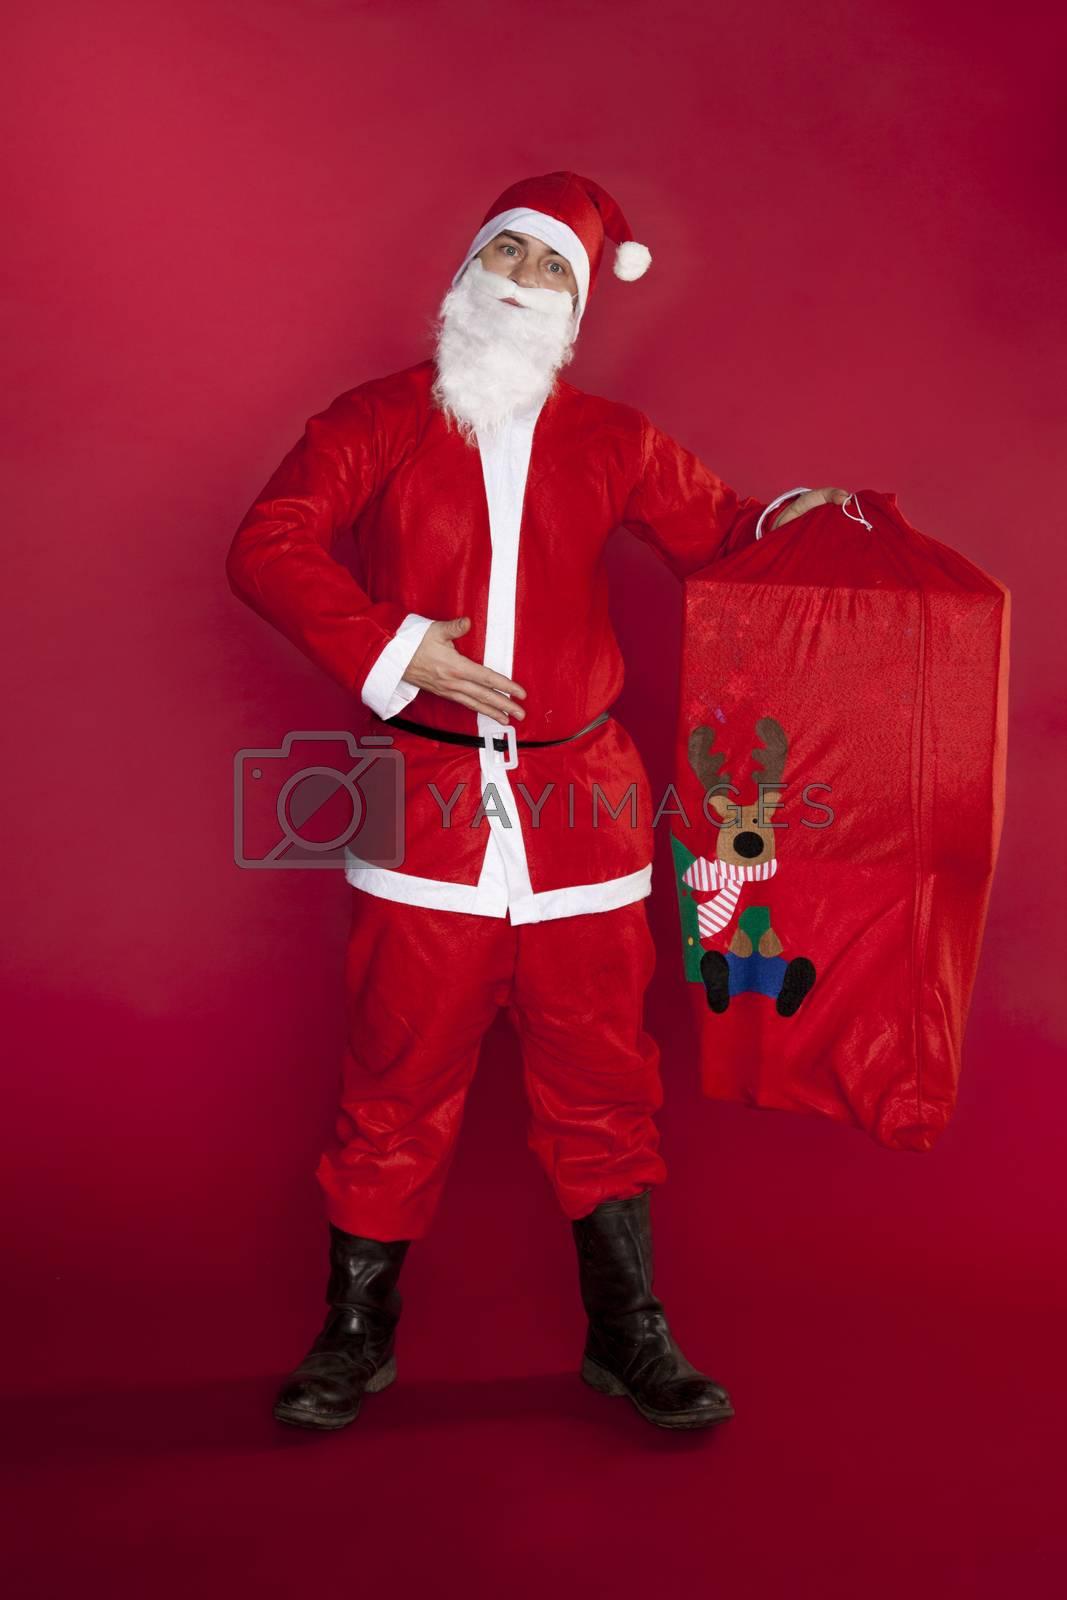 Santa Claus shows a gift bag